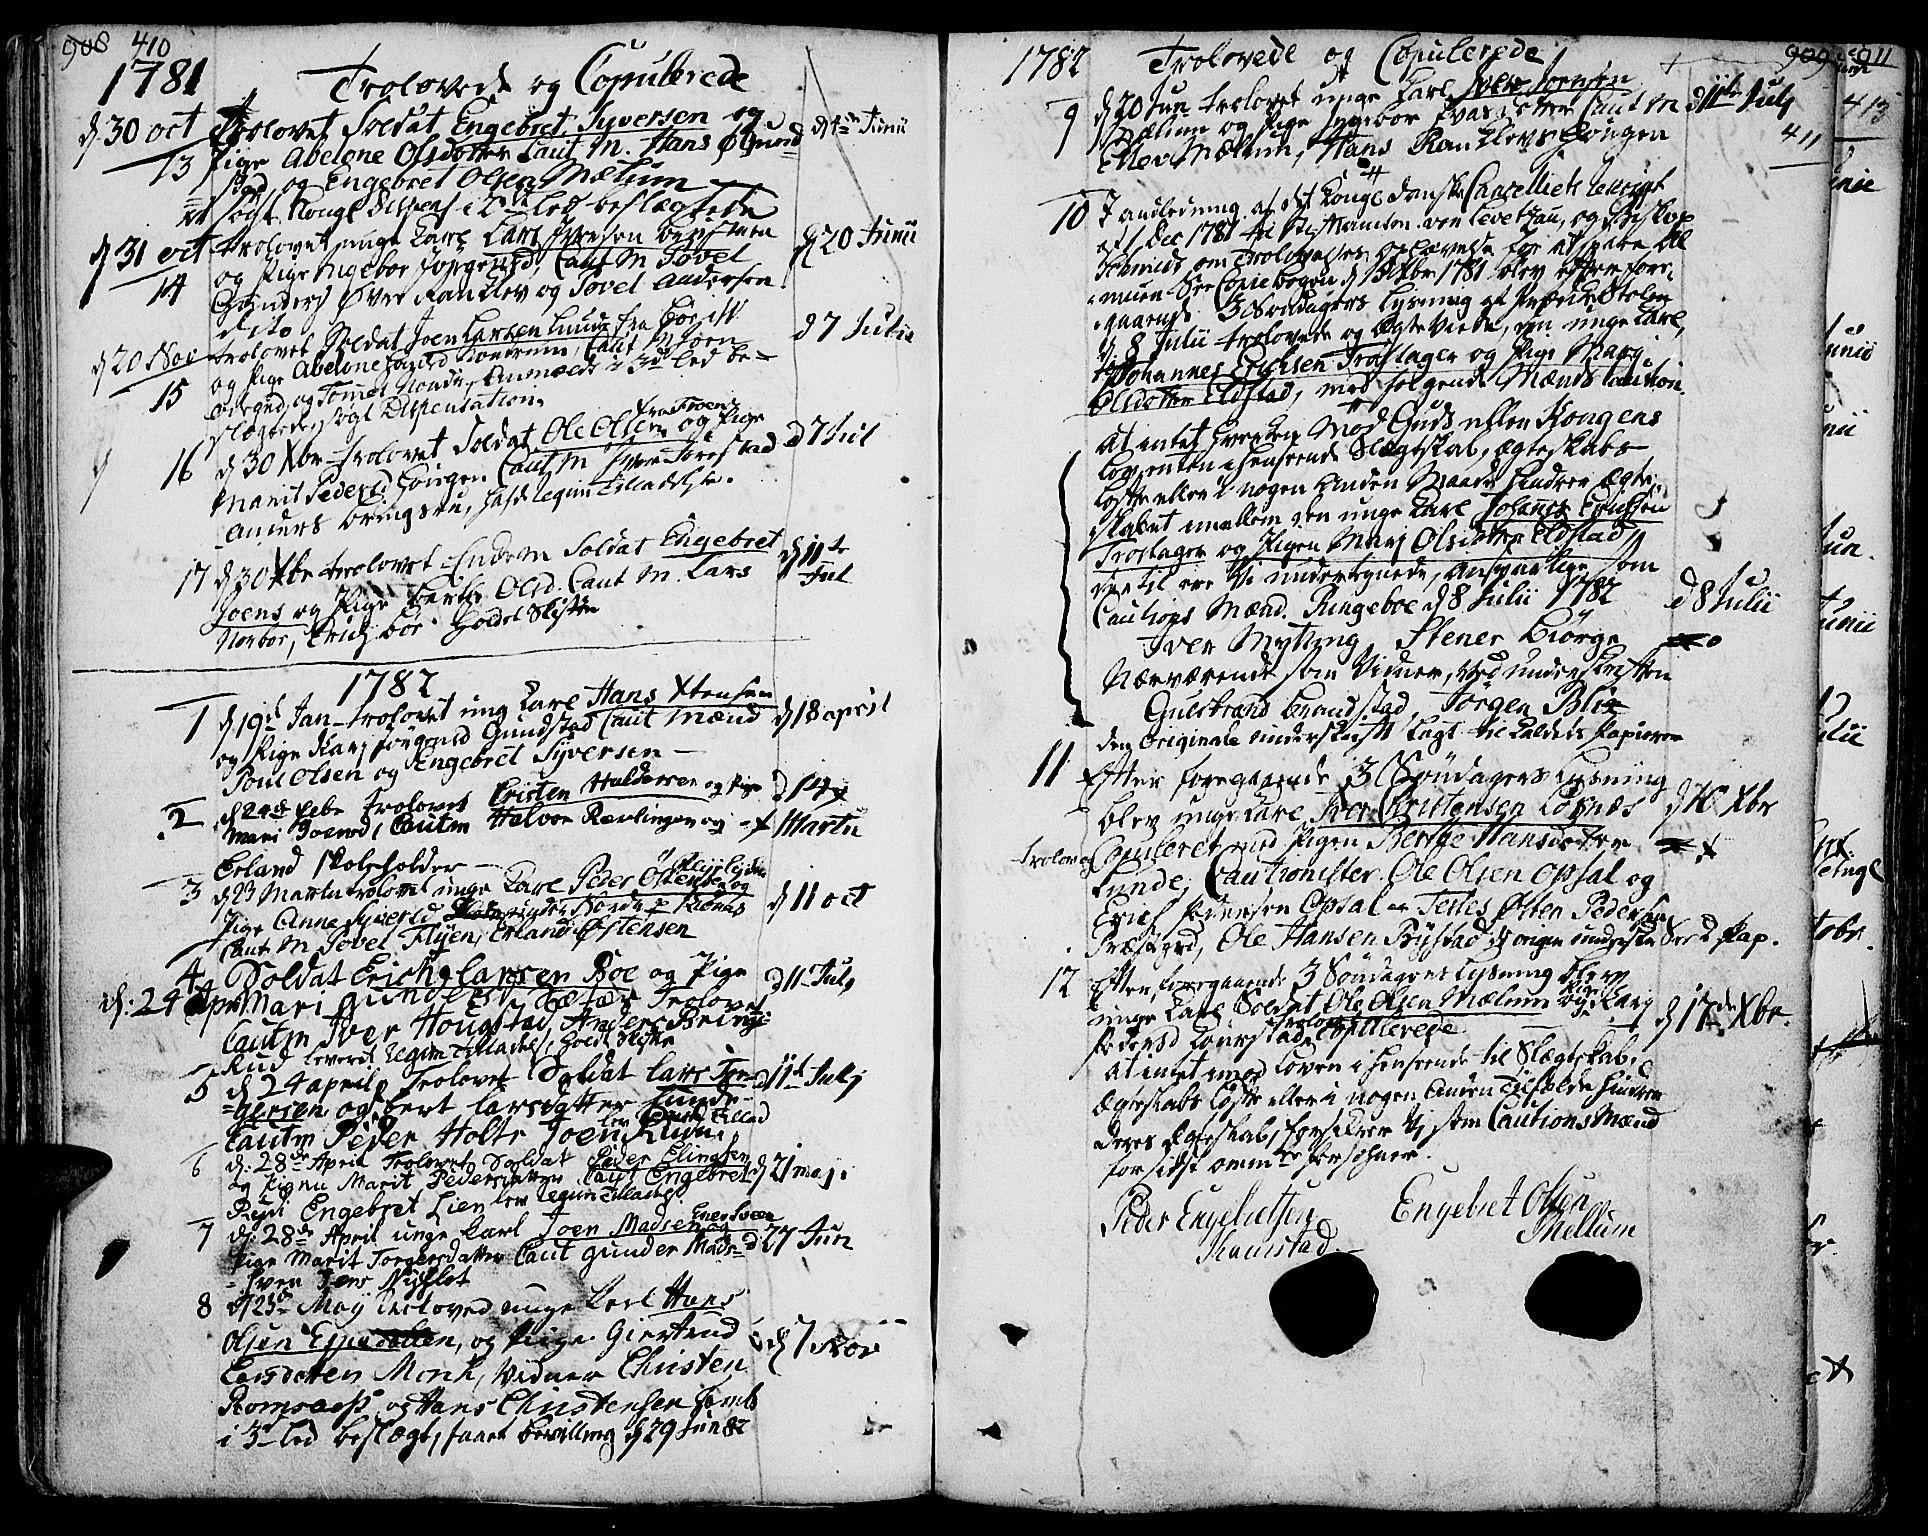 SAH, Ringebu prestekontor, Ministerialbok nr. 3, 1781-1820, s. 410-411